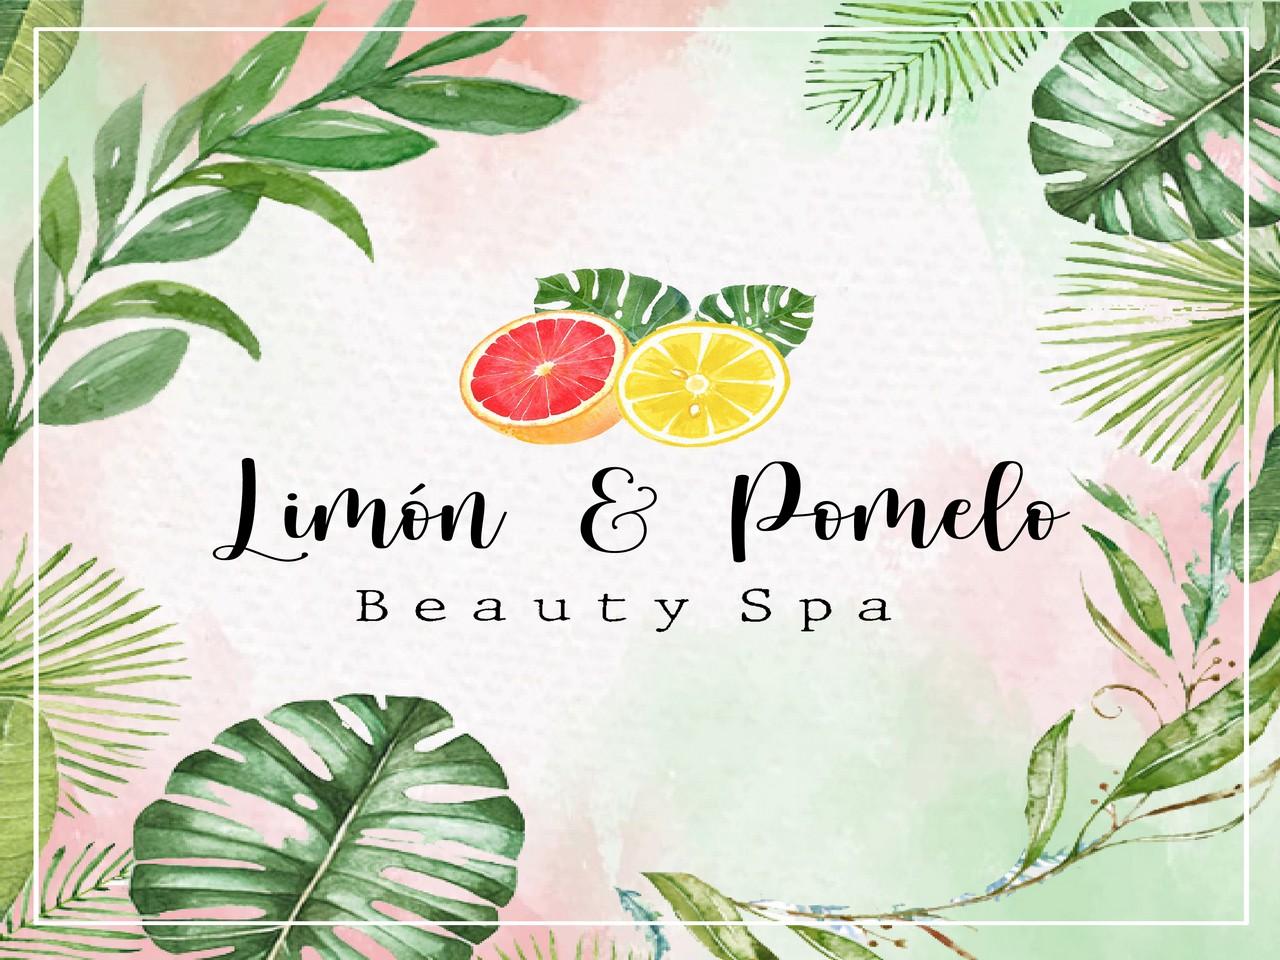 Limón & Pomelo Beauty Spa - Camila